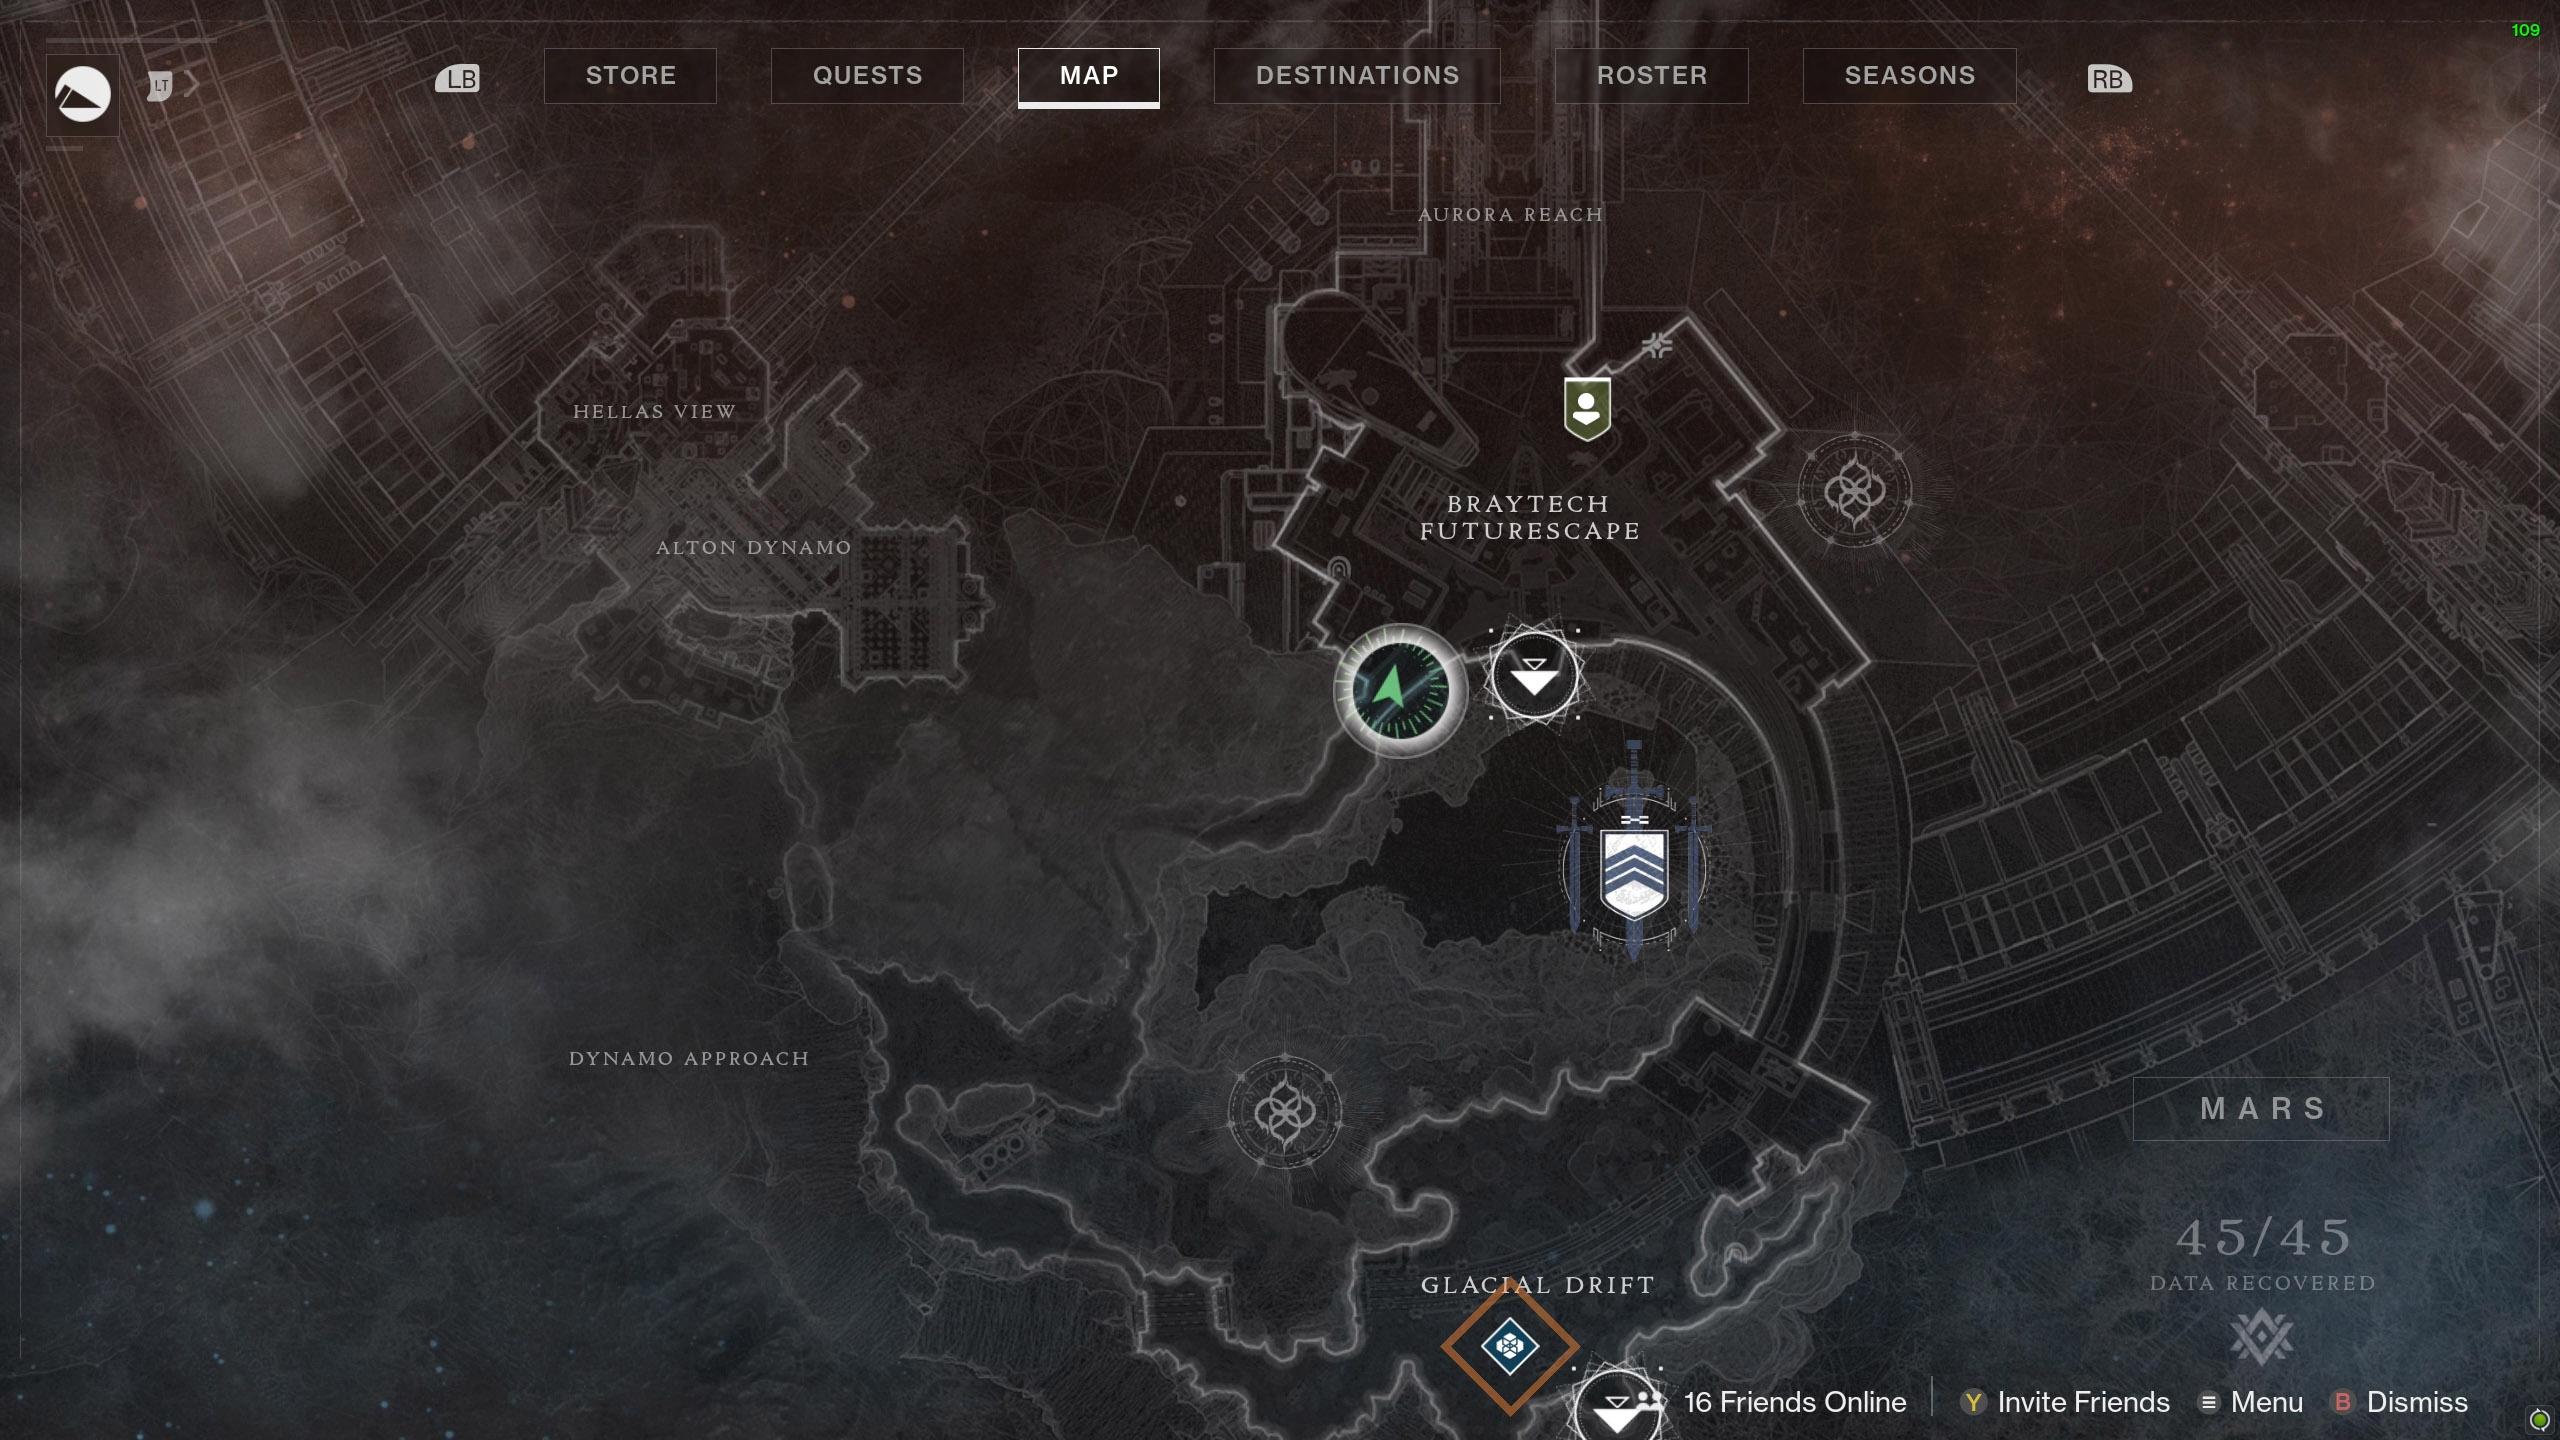 Destiny 2 Savathuns Eyes Mars Braytech Futurescape 1 map